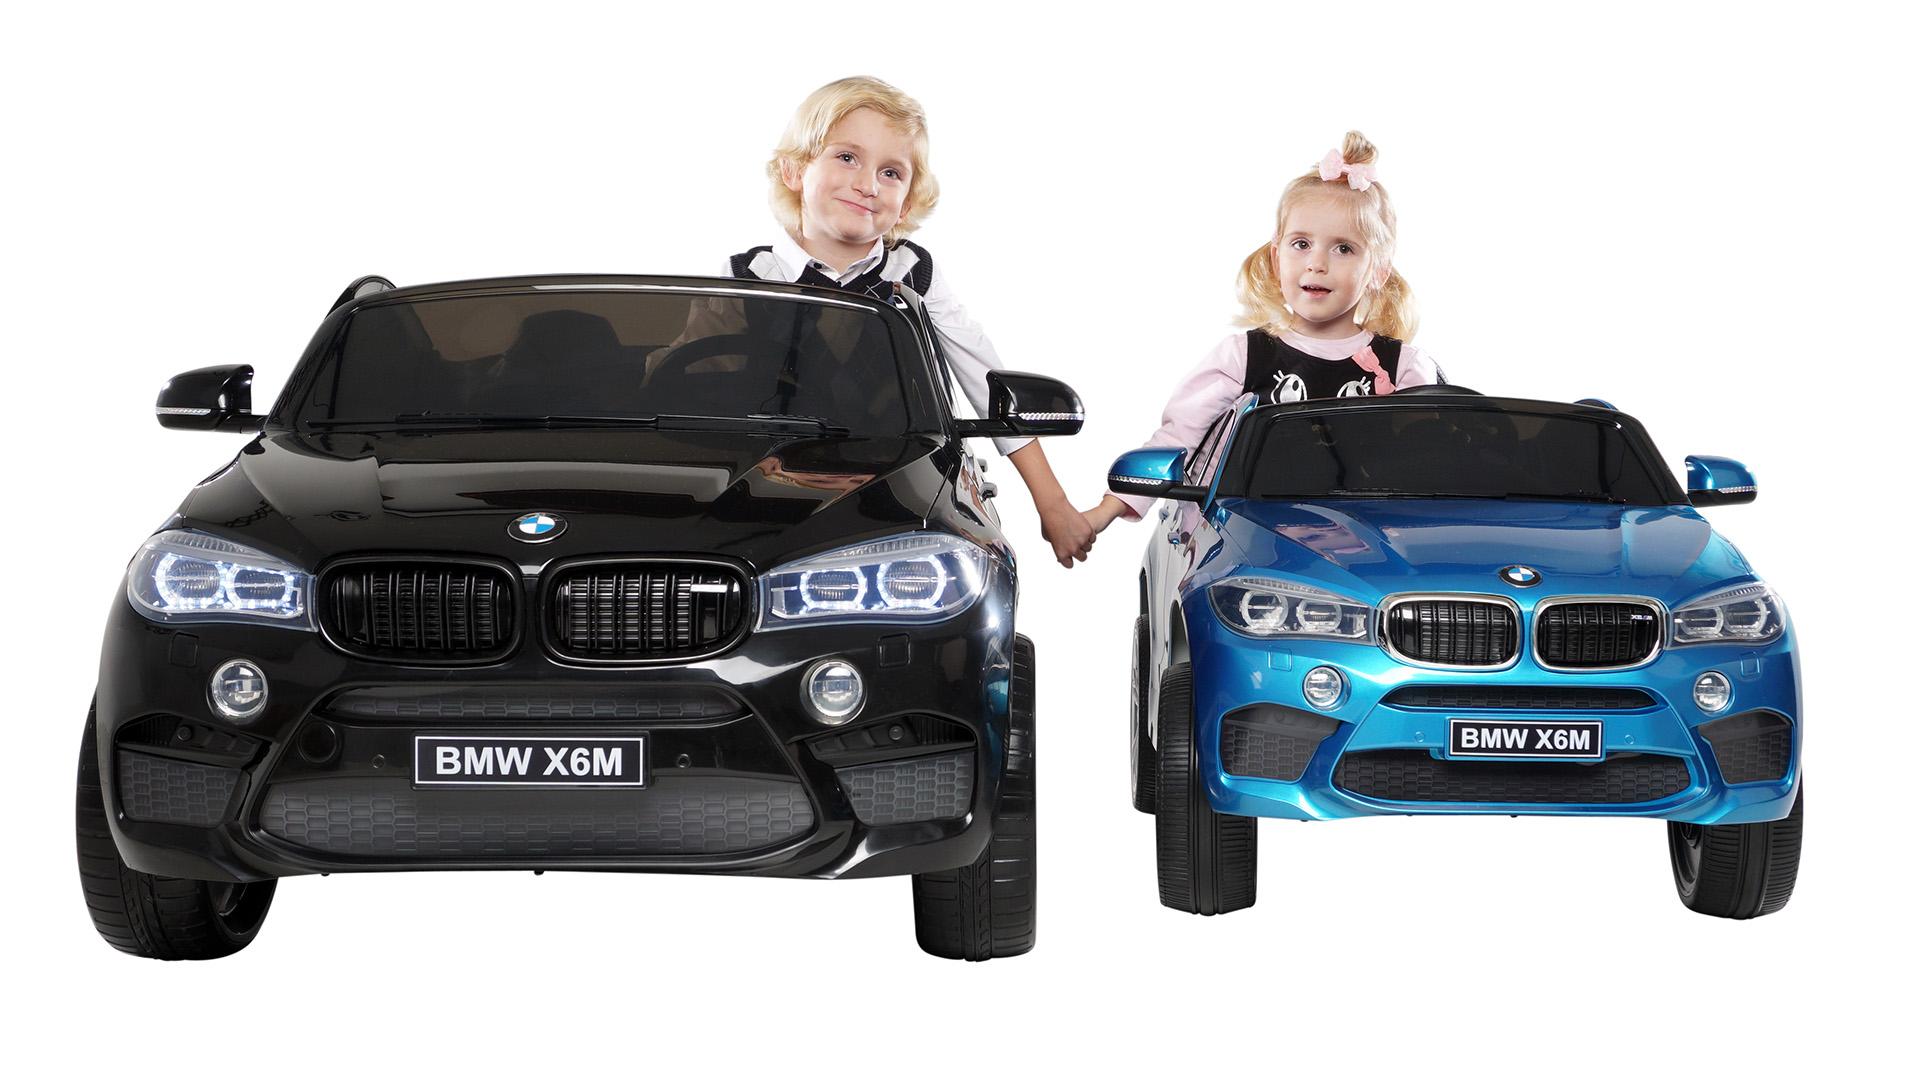 iwheels kinder elektroauto bmw x6m f16 xxl zweisitzer. Black Bedroom Furniture Sets. Home Design Ideas